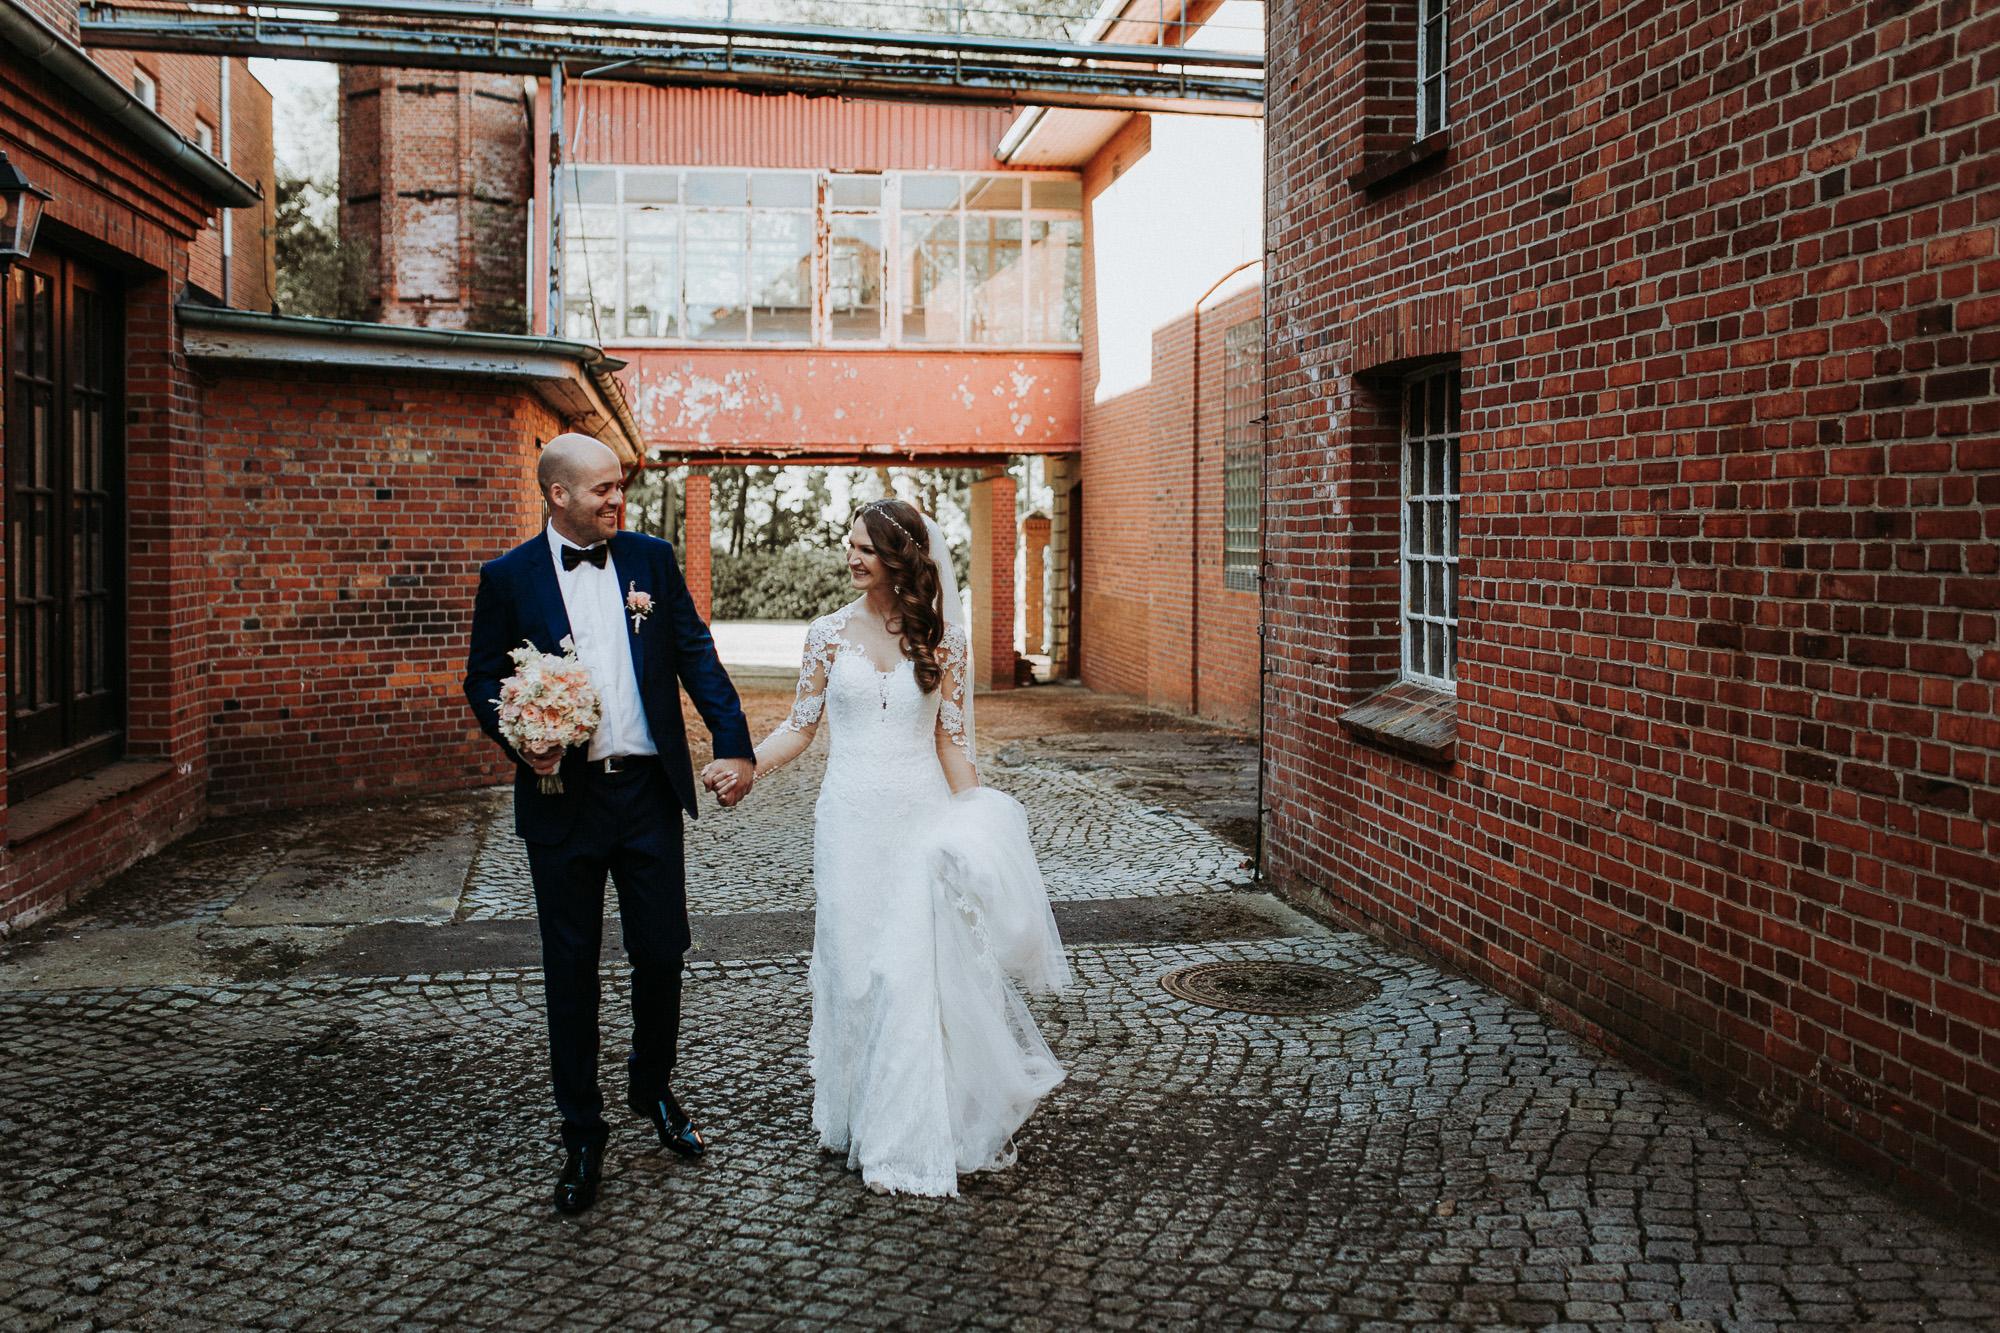 DanielaMarquardtPhotography_Hochzeitsfotograf_Düsseldorf_Köln_Mallorca_Bayern_Austria_Harz_Coupleshoot_AileenundLennart_Weddingphotographer_Ibiza_Tuskany_Italien_Toskana_Portugal_Lissabon1